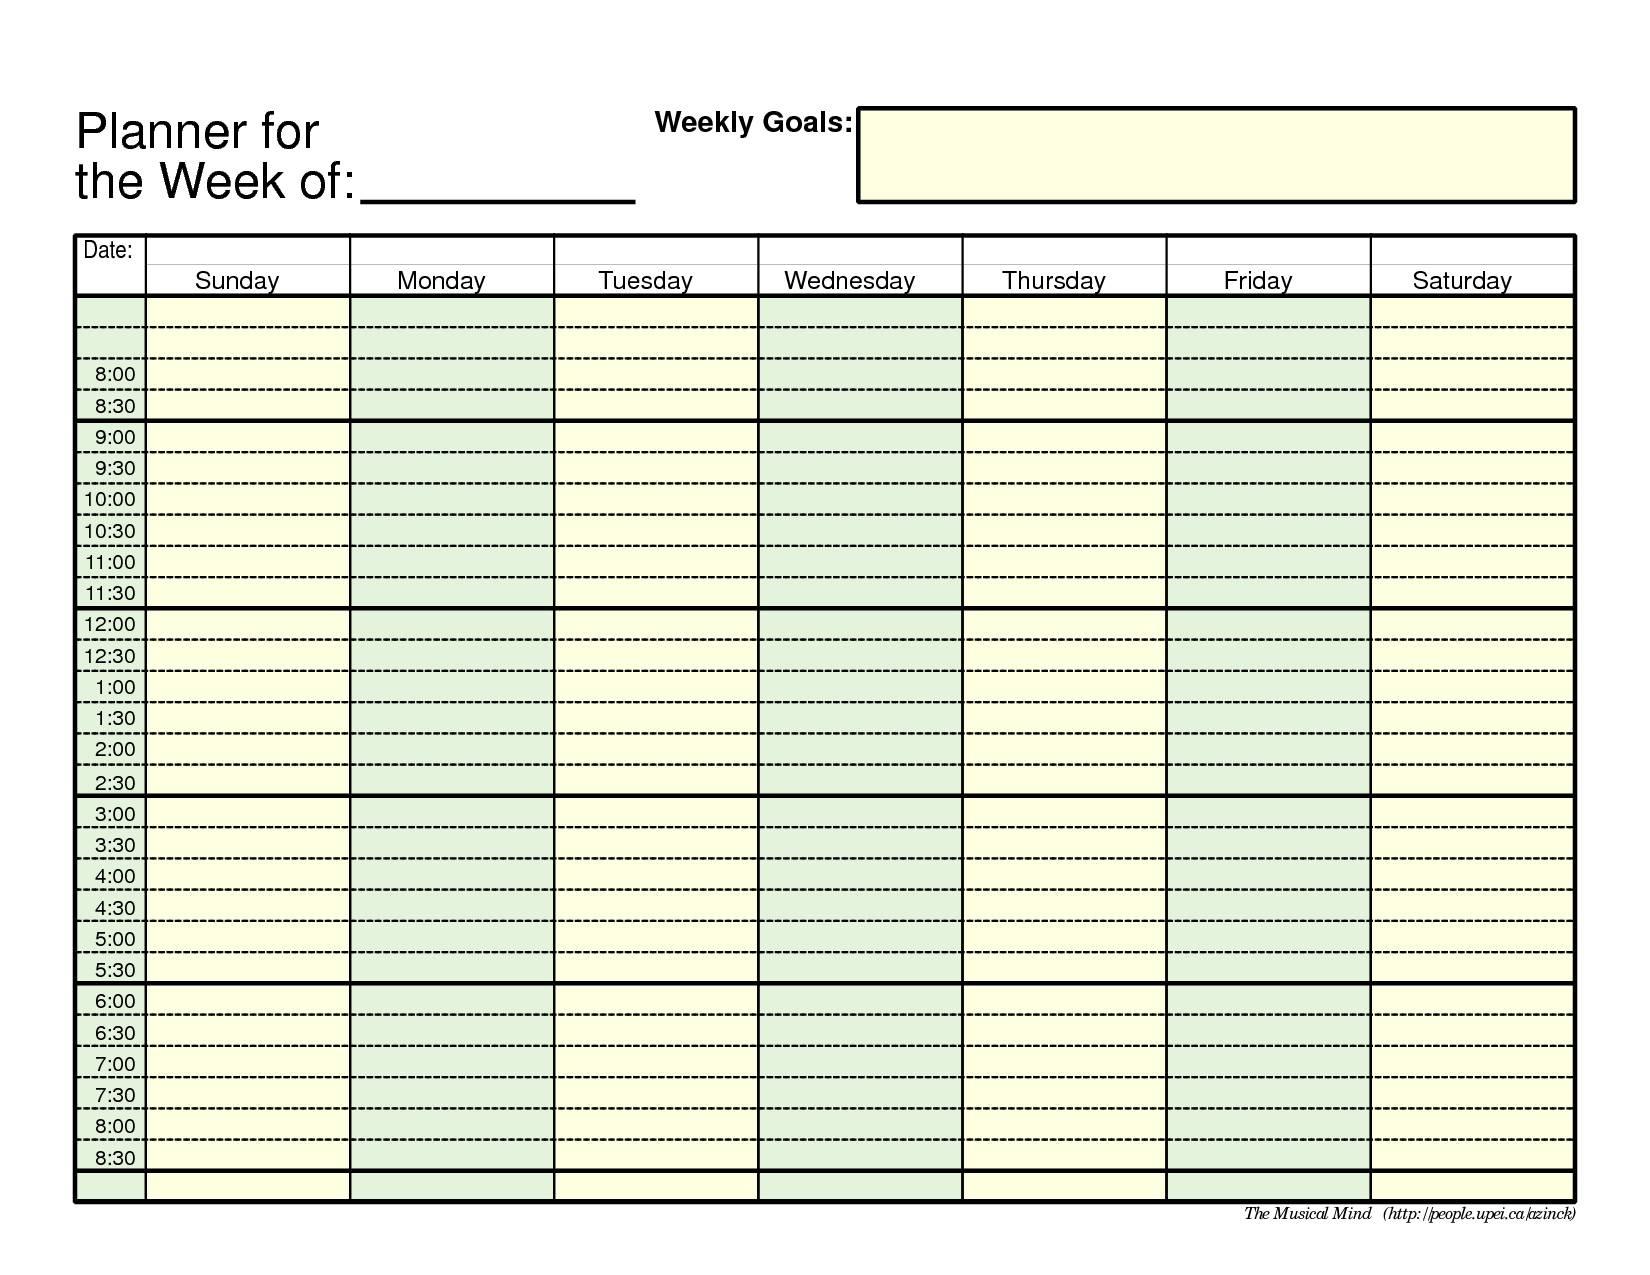 Weekly Planner Template Image 3 Craft Ideas Pinterest 89uj